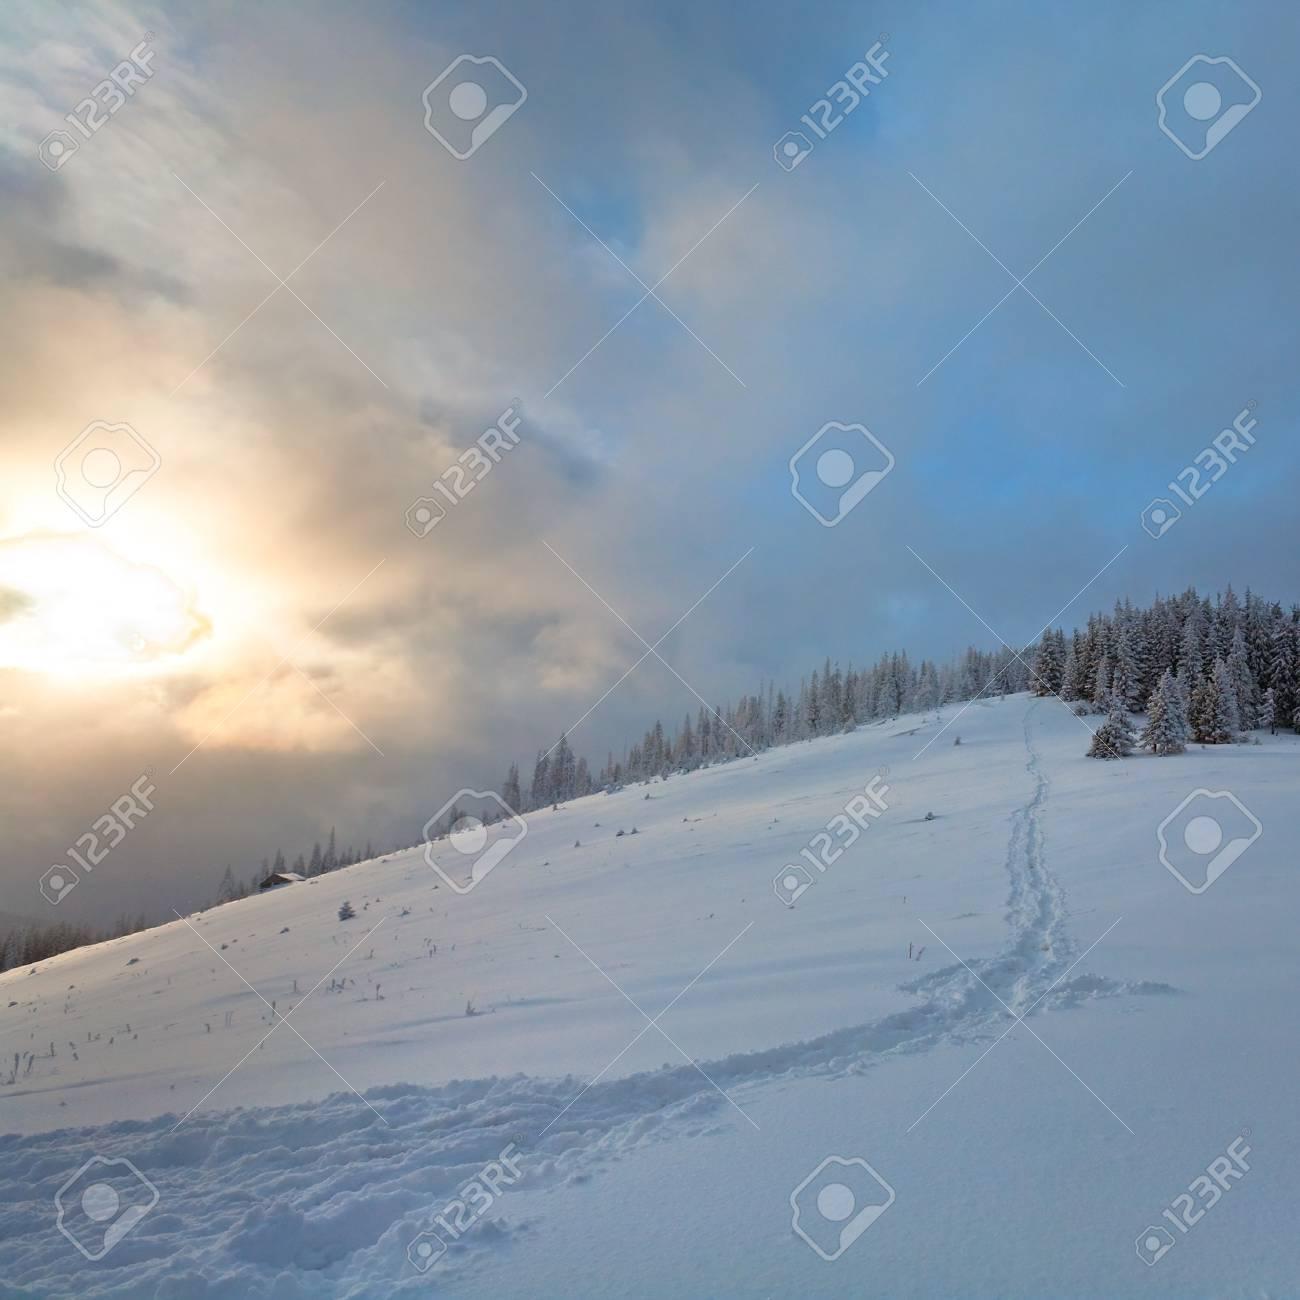 winter evening  calm mountain landscape with fir trees  on slope (Kukol Mount, Carpathian Mountains, Ukraine) Stock Photo - 8303774